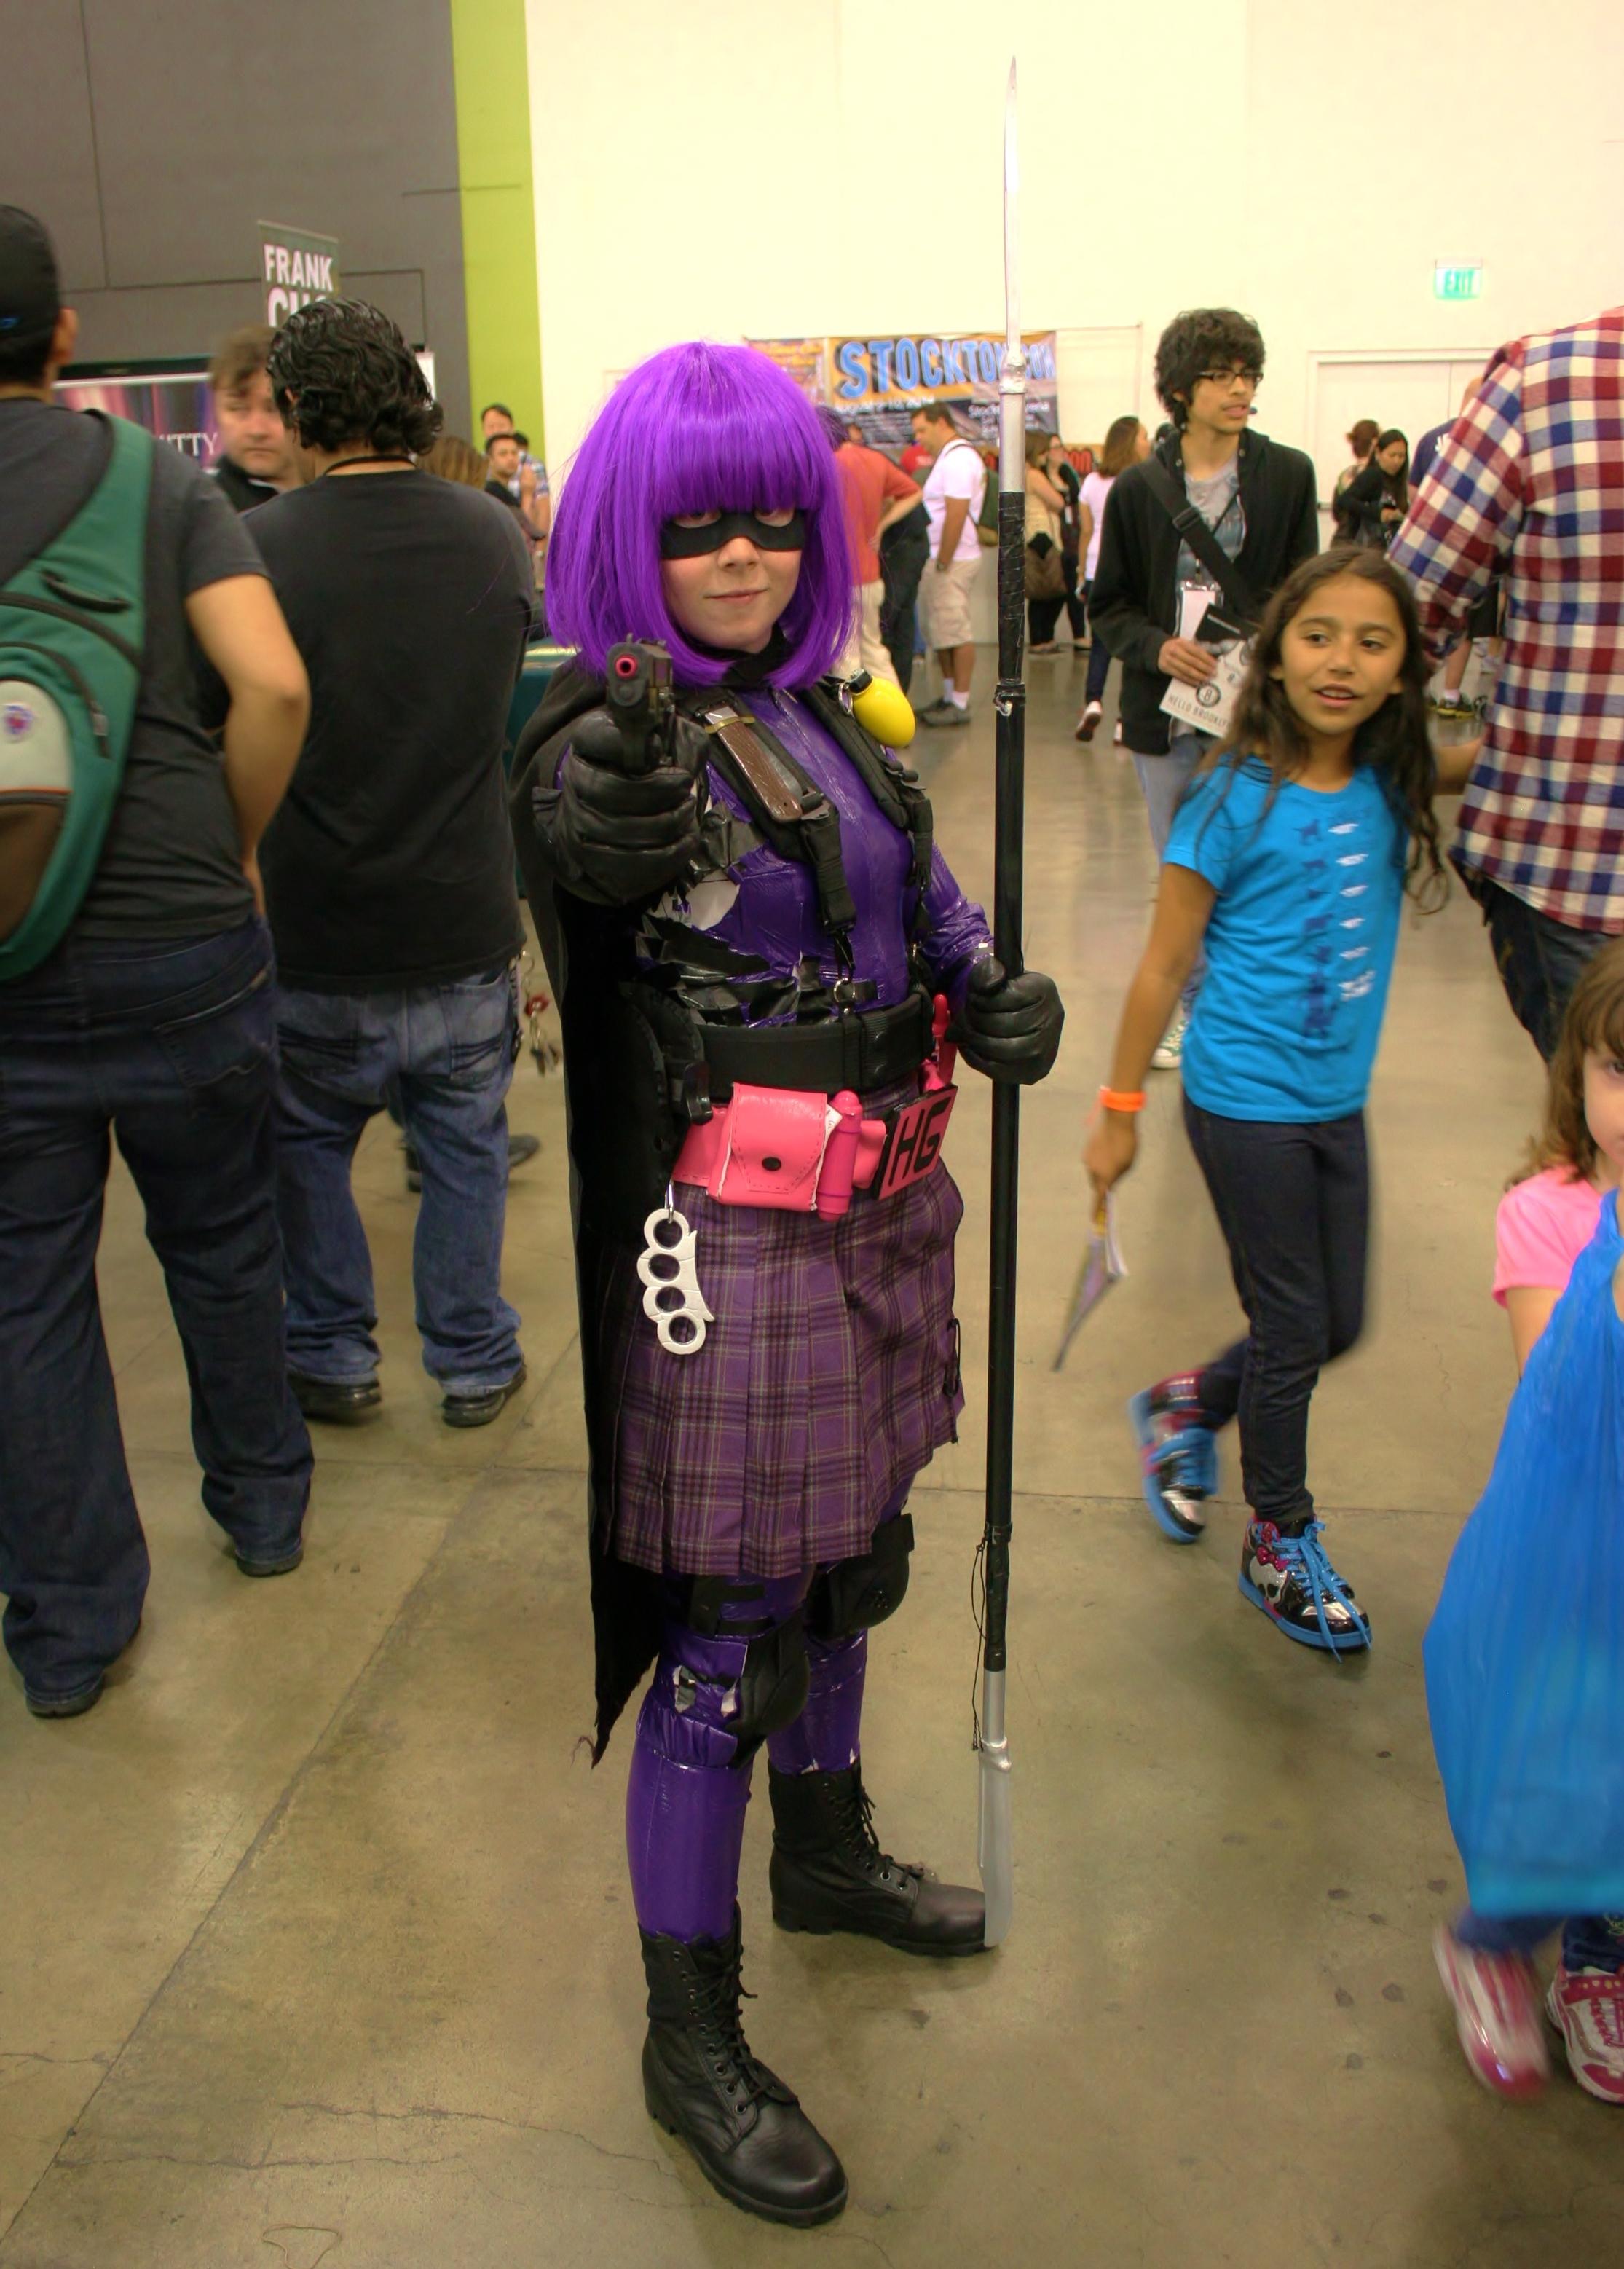 X men girls cosplay dating